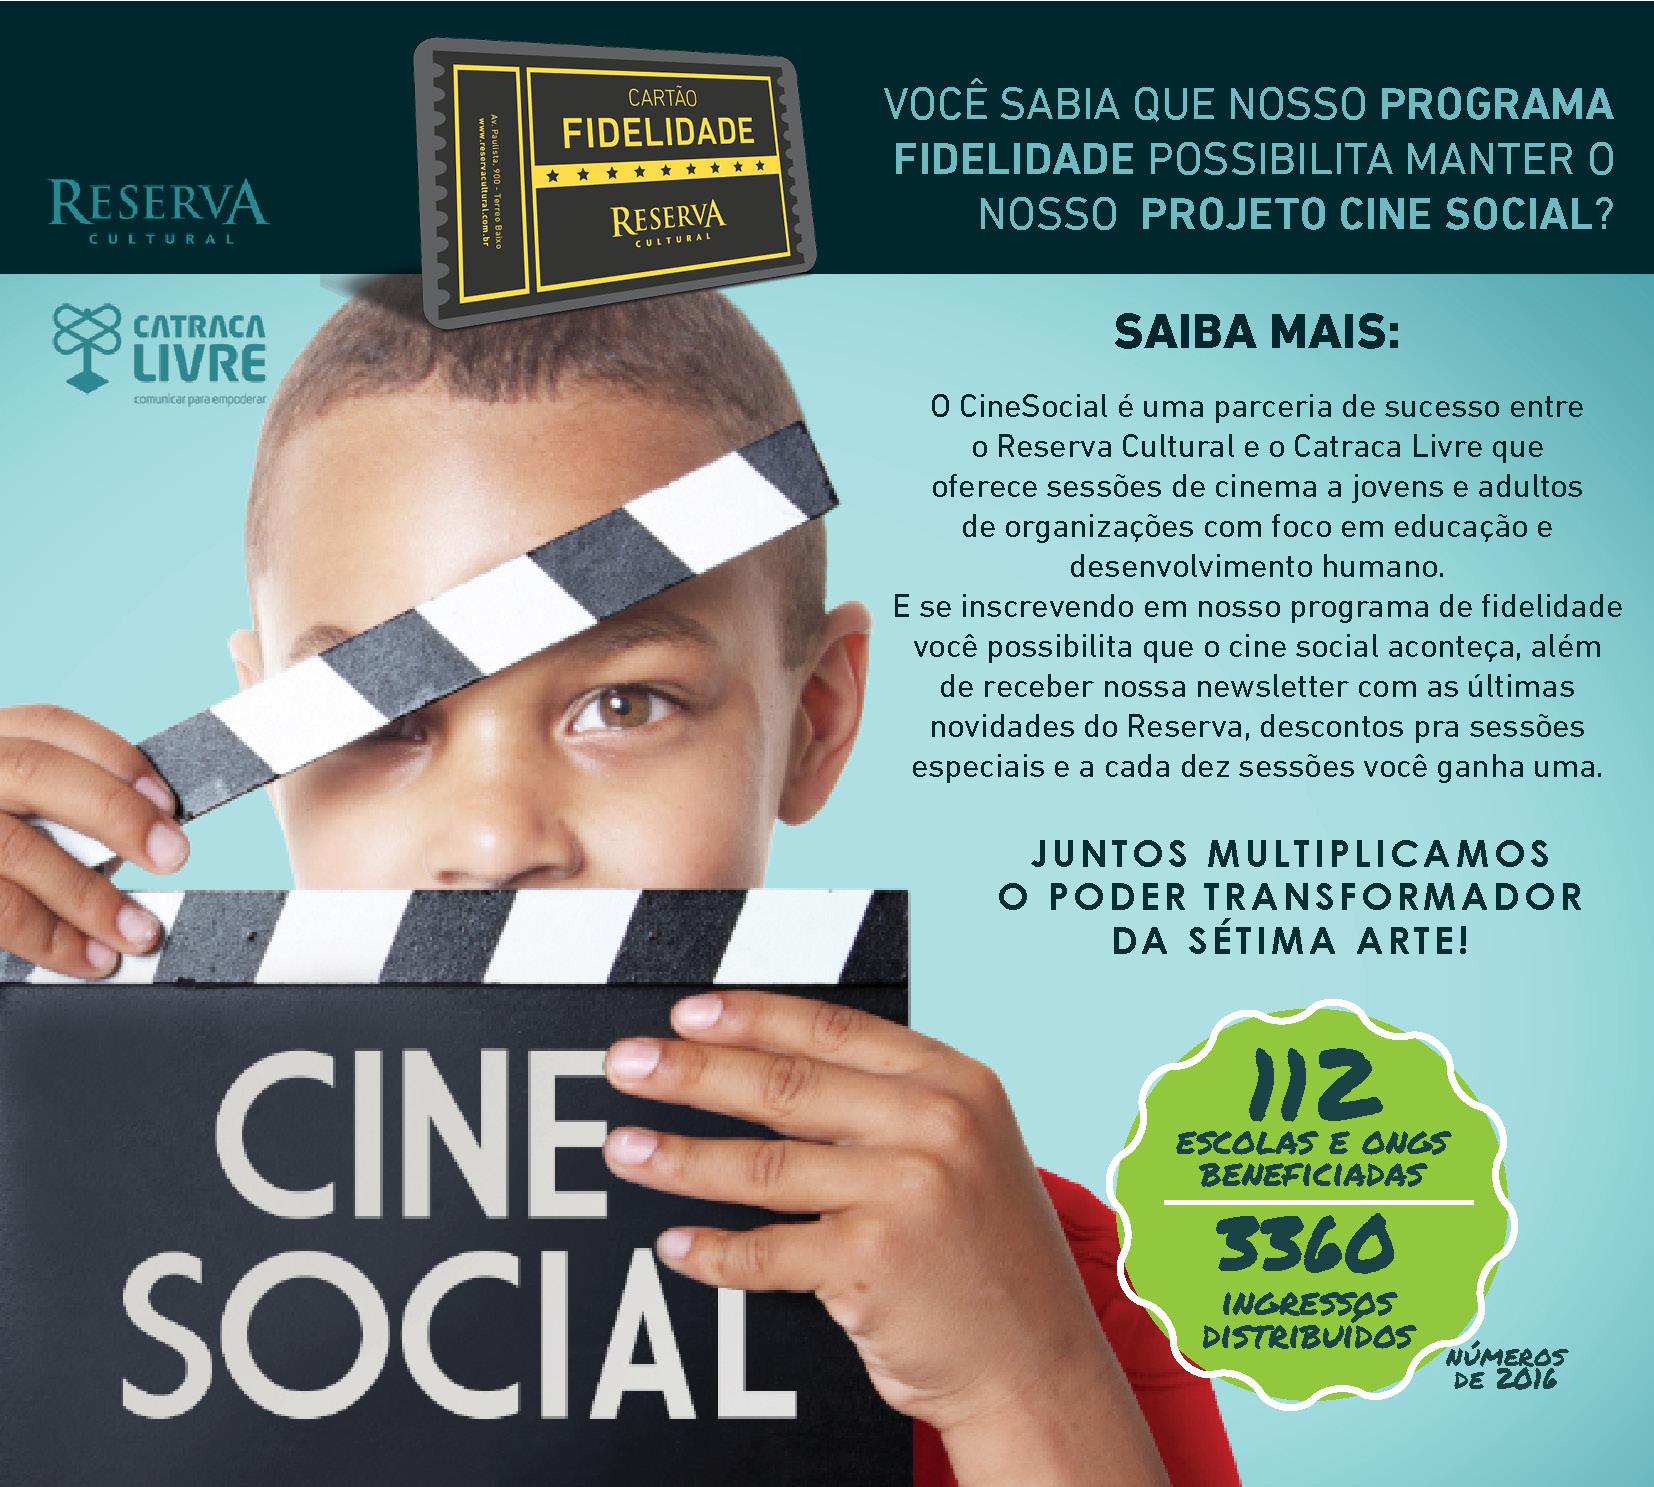 cine social 2017_fideli2 (004)